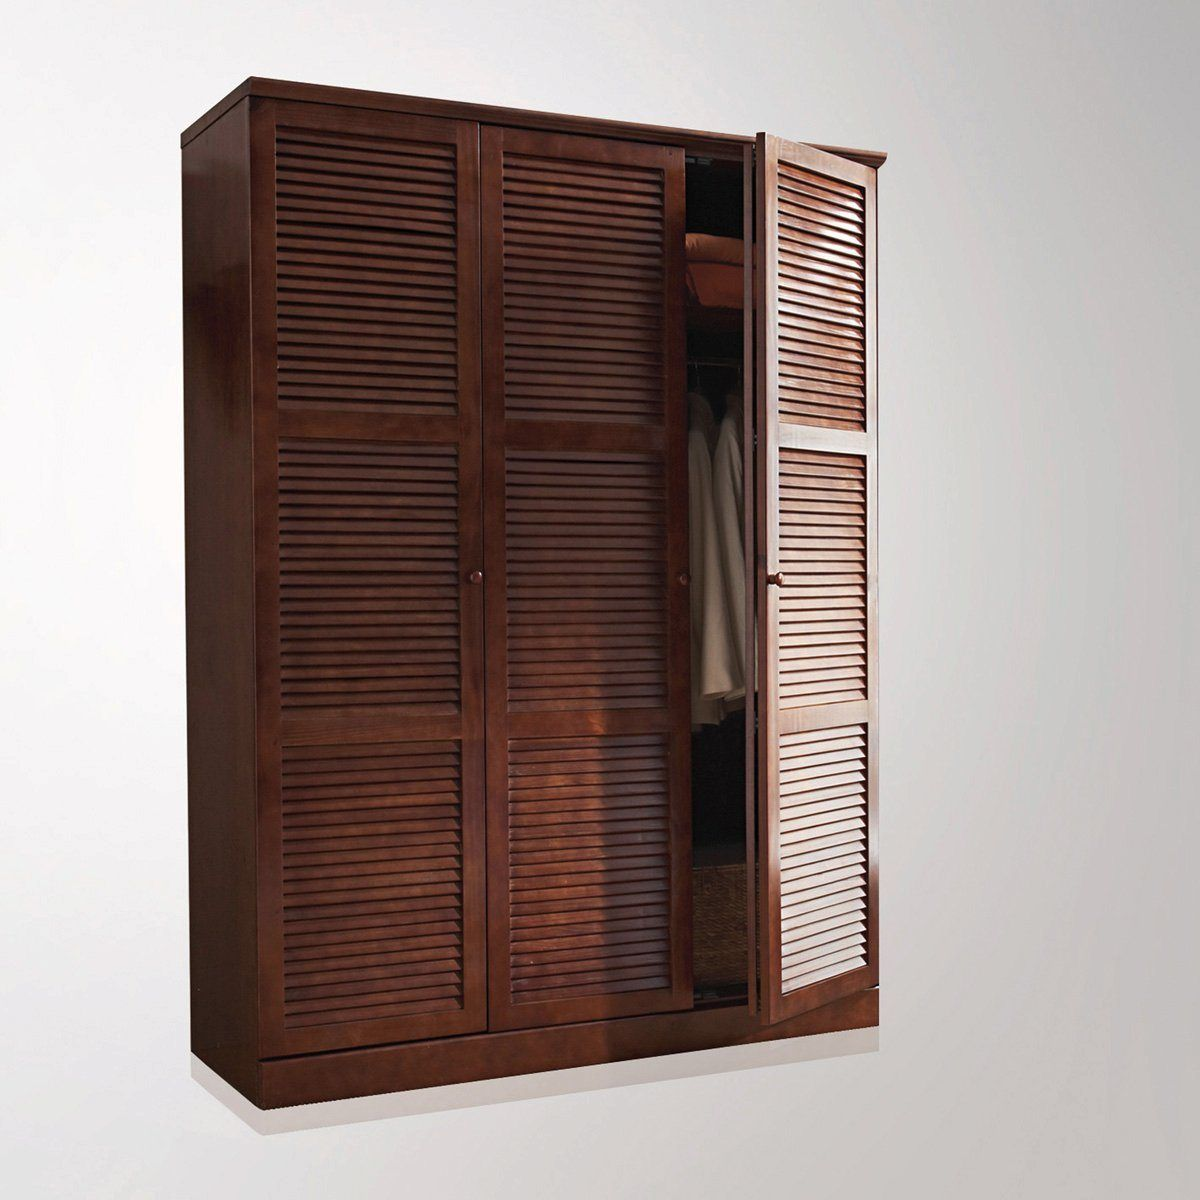 soldes armoire la redoute armoire pin